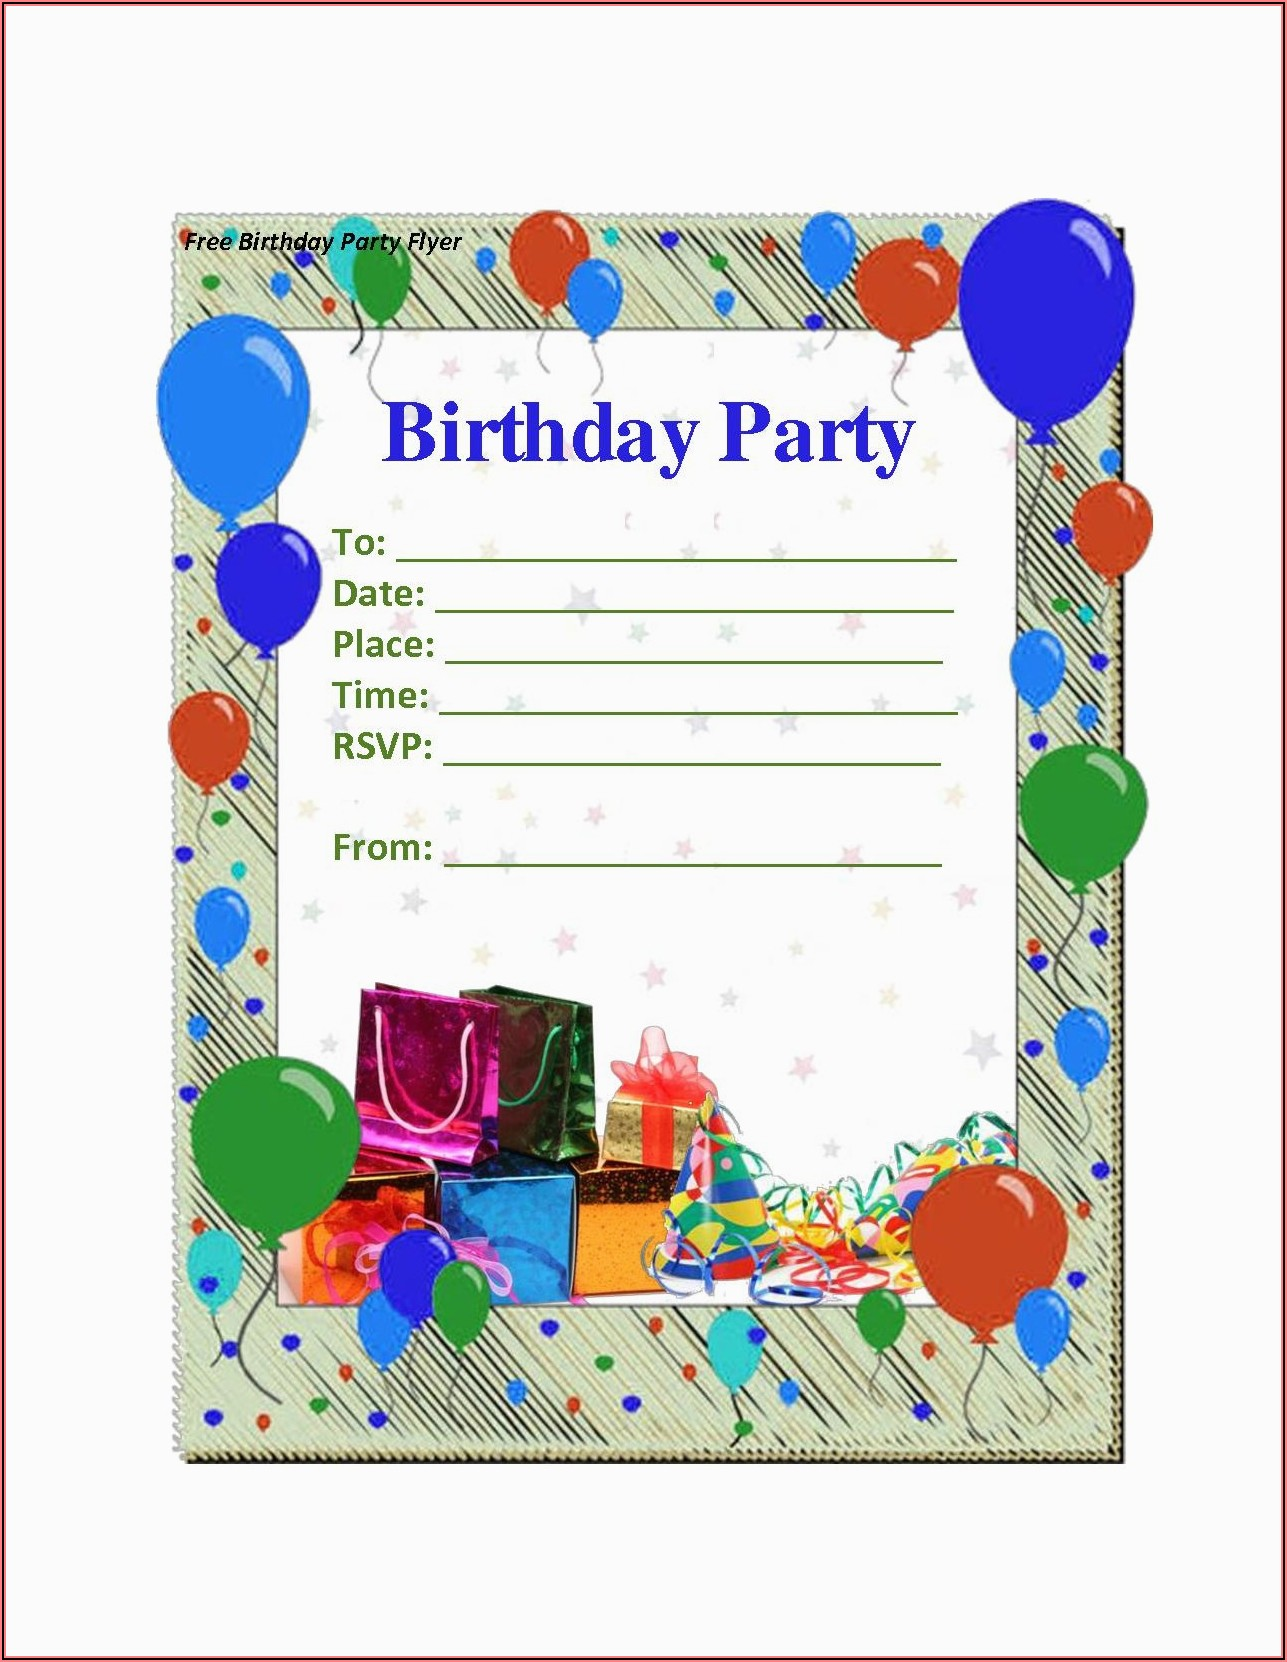 Creating Birthday Invitations Free Online